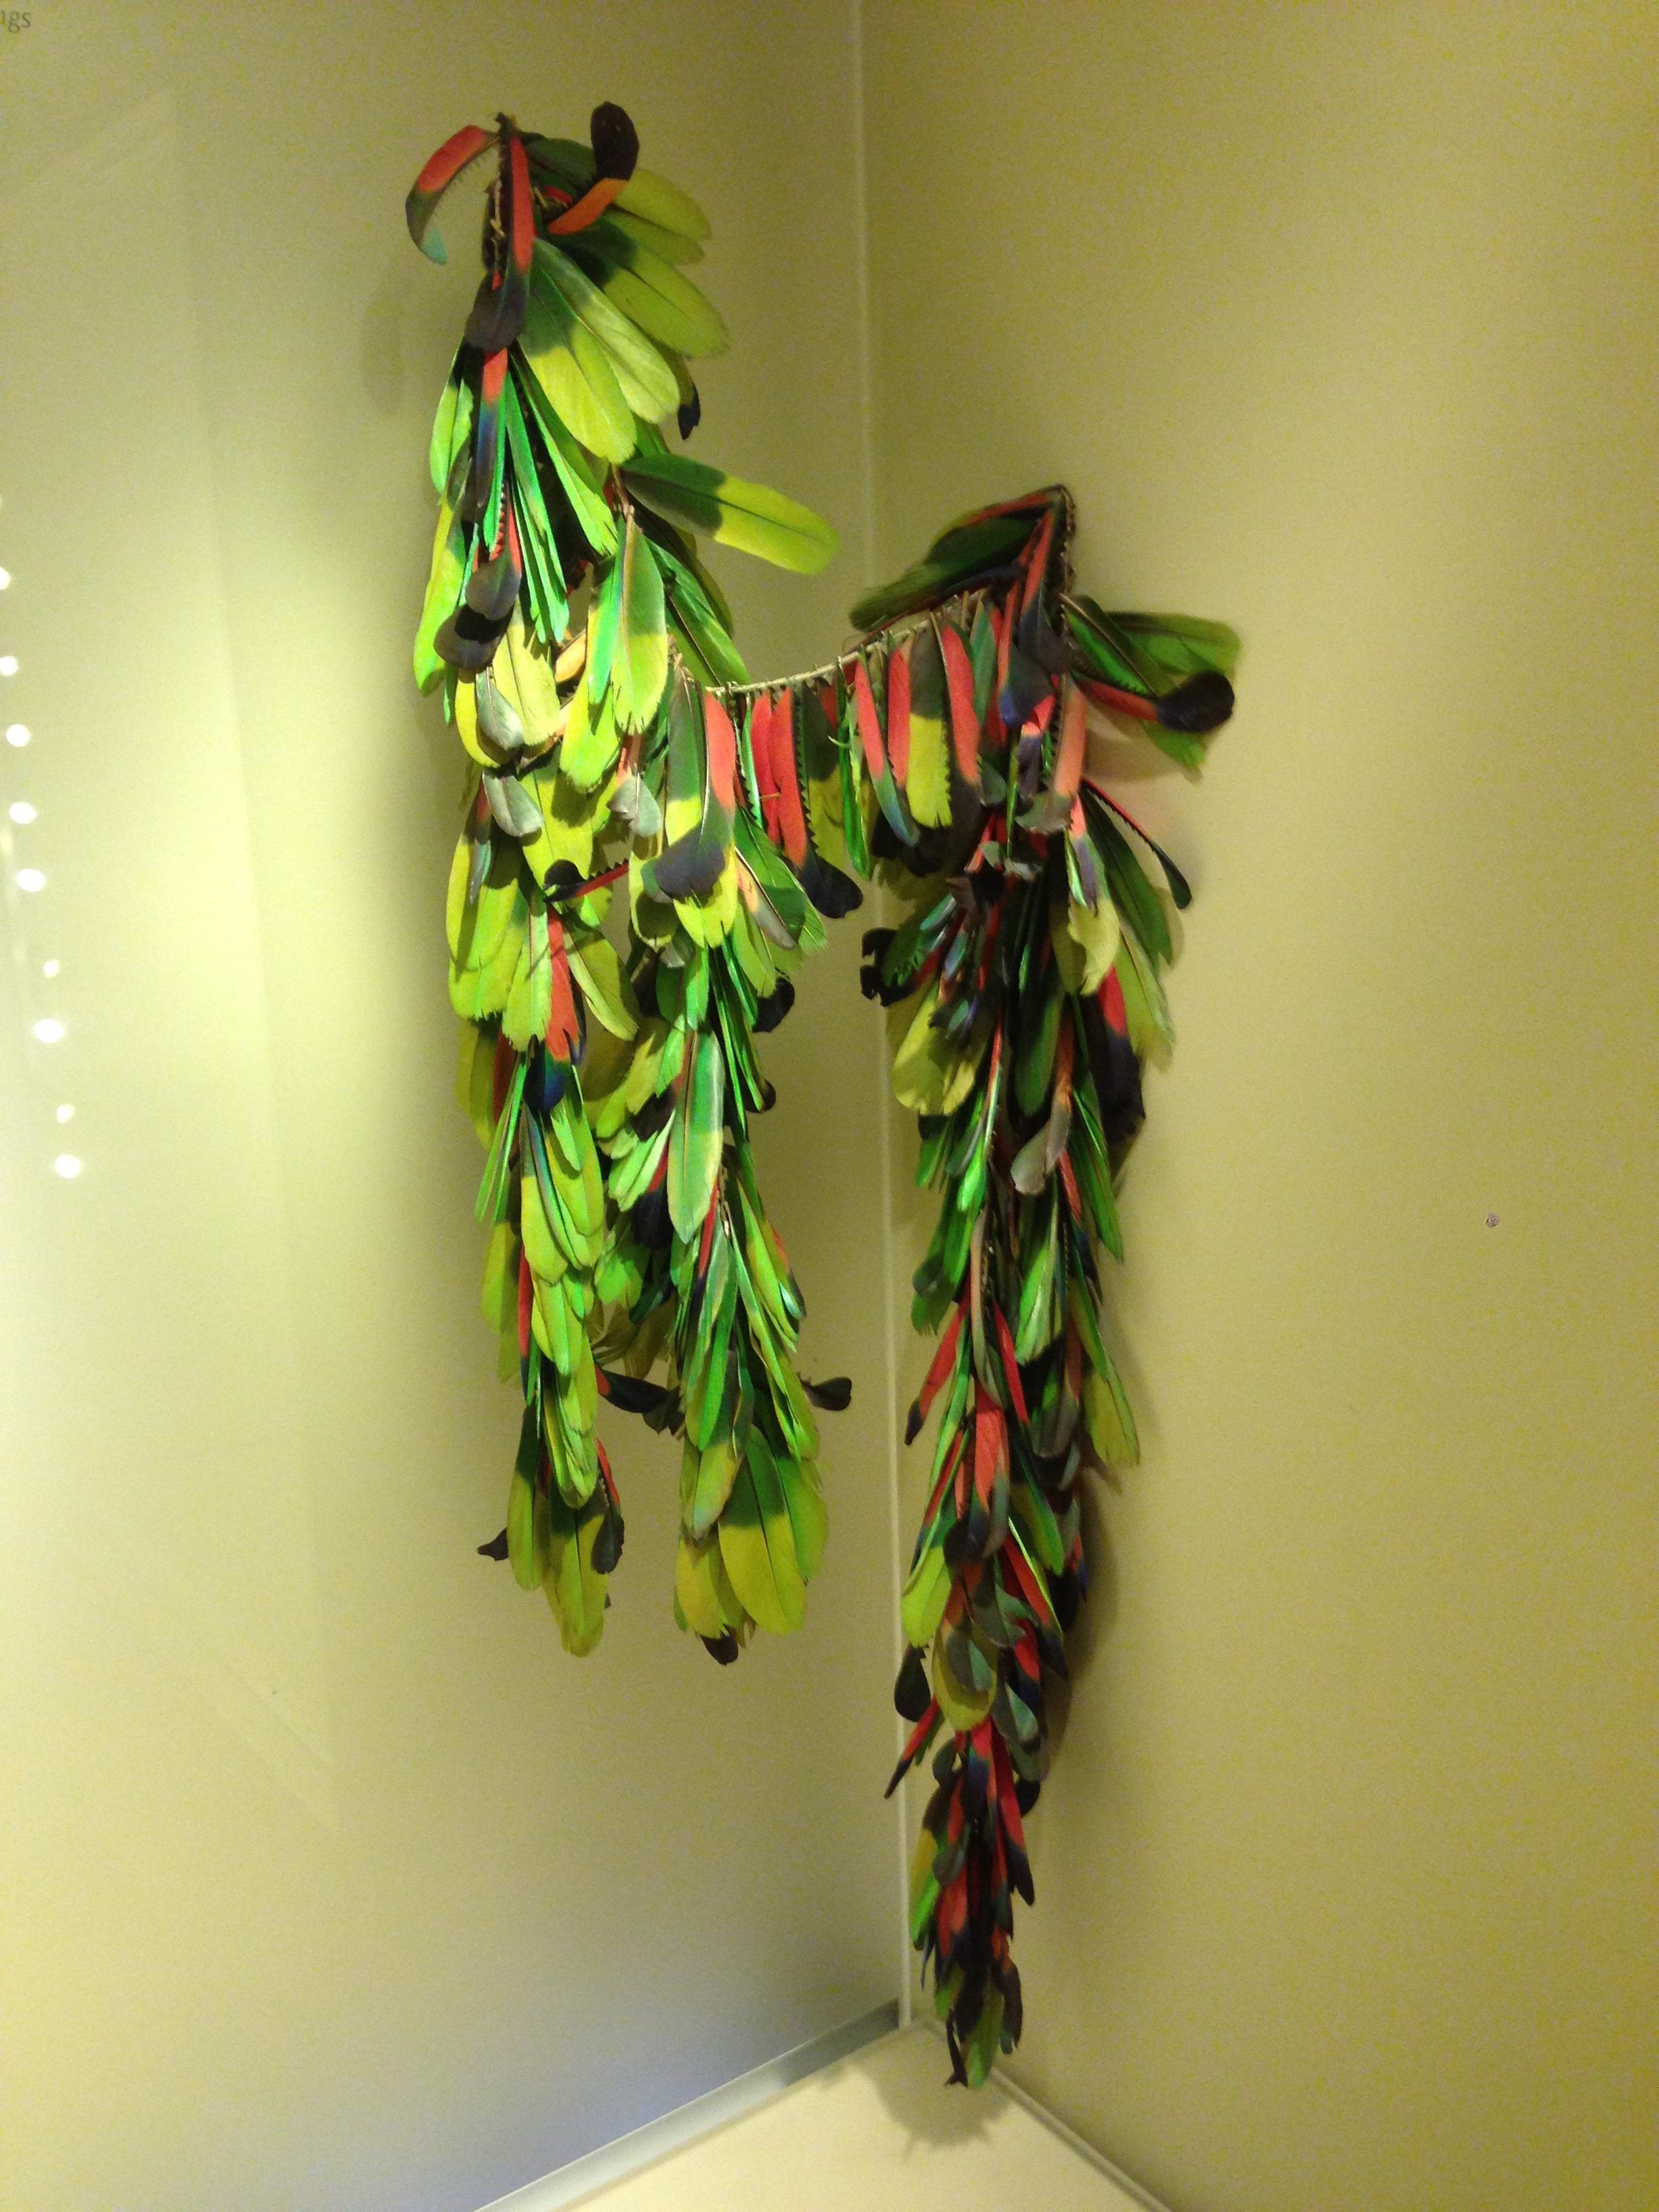 Free Images : branch, plant, leaf, flower, window, green, color ...